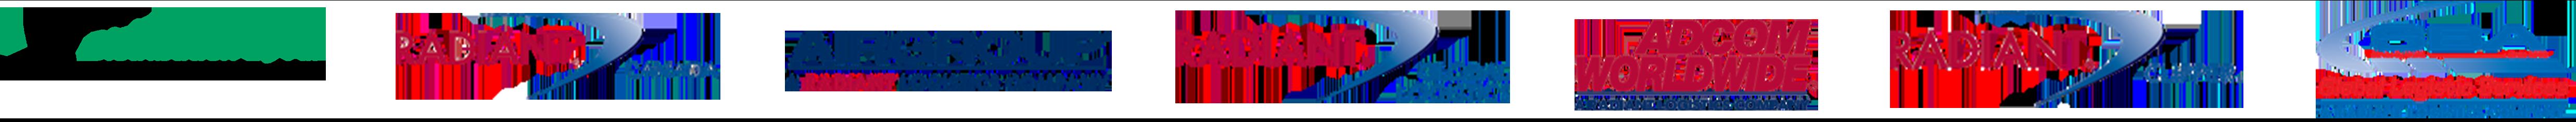 Network brand logos